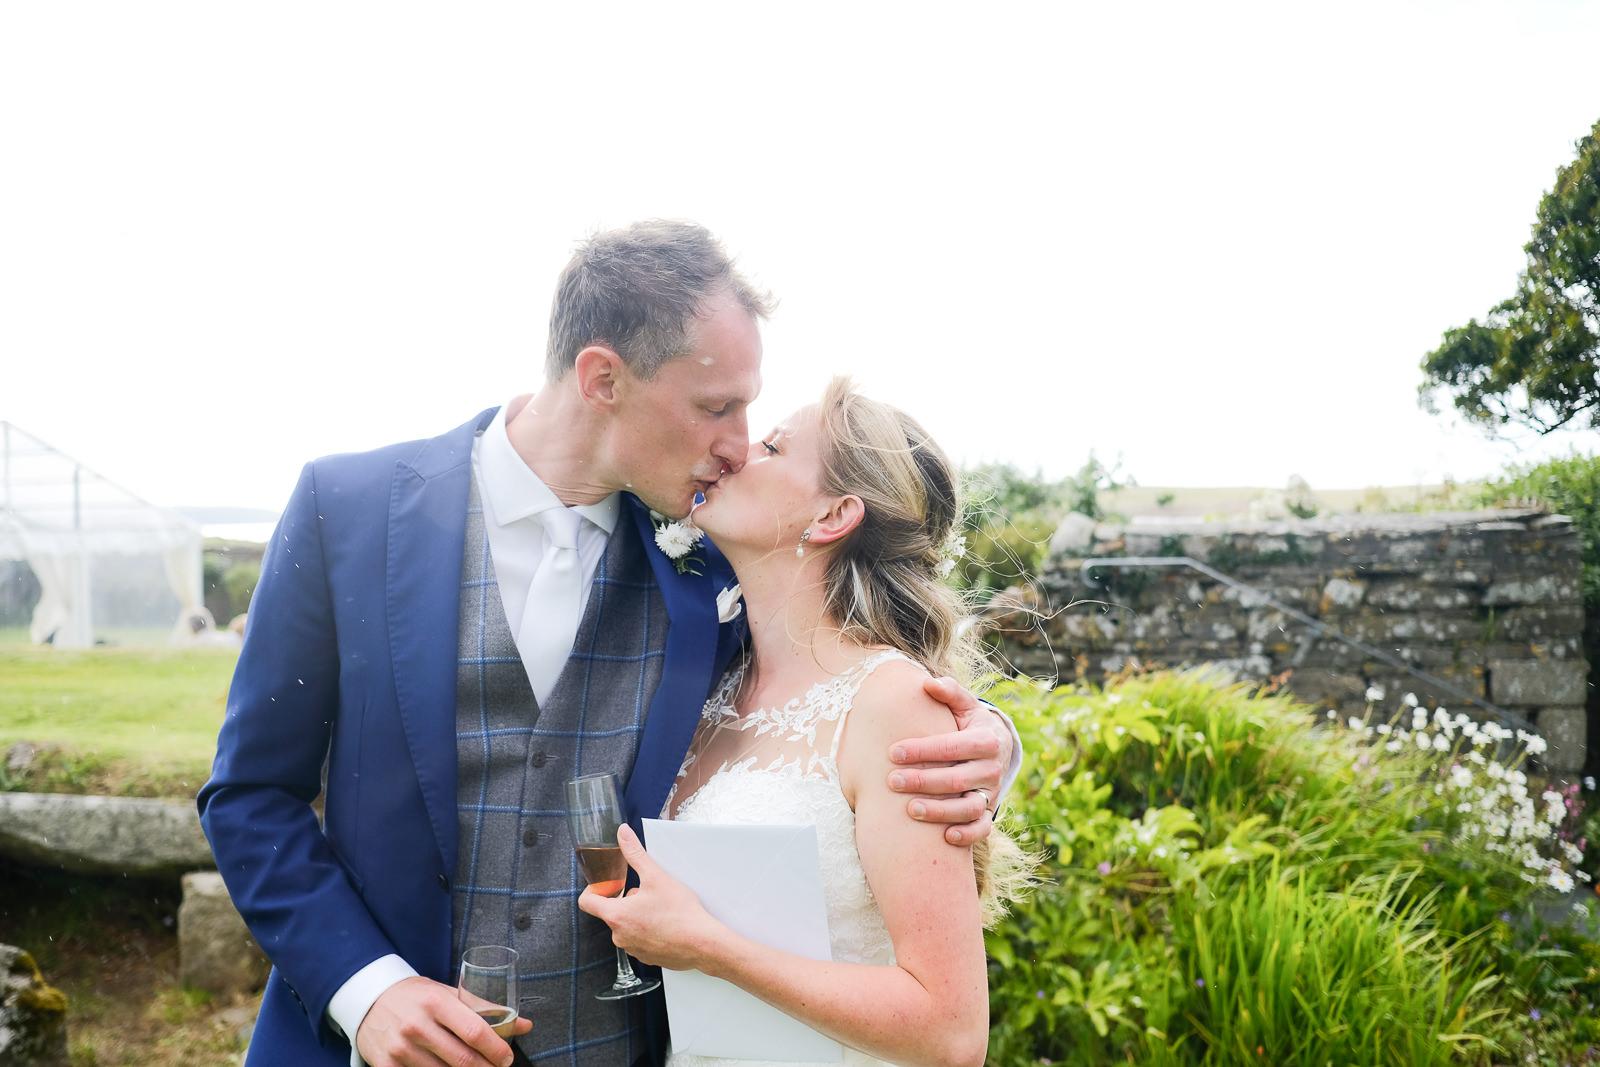 Roscarrock Farm wedding in Cornwall 067.jpg